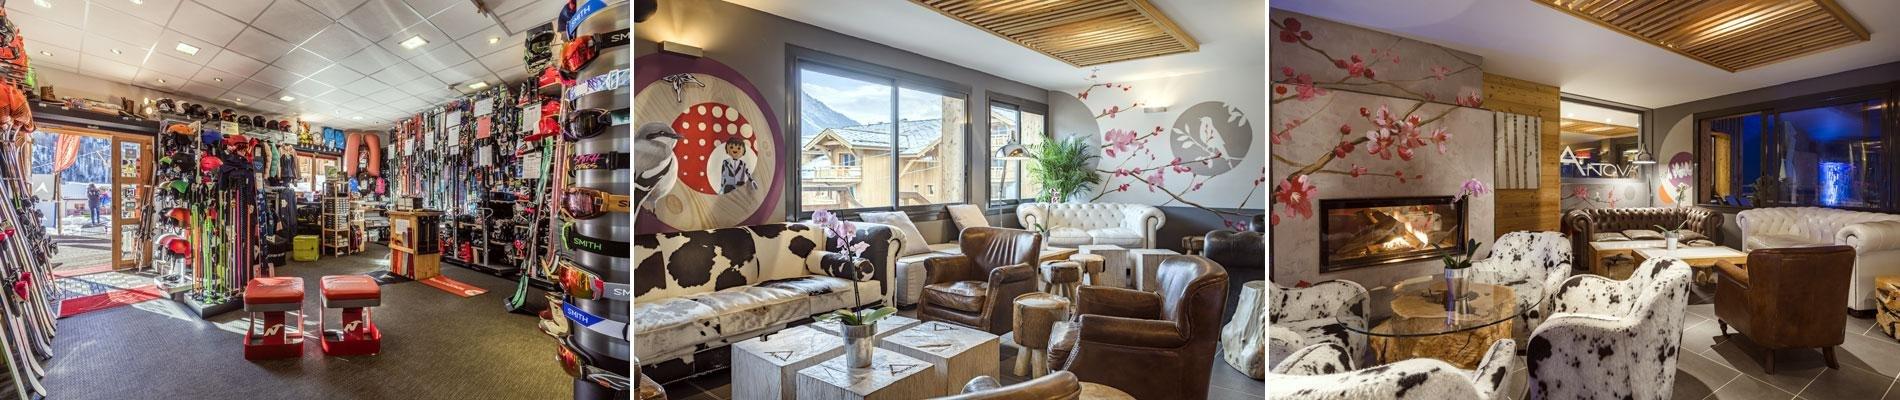 hotel anova montgenevre ski wintersport